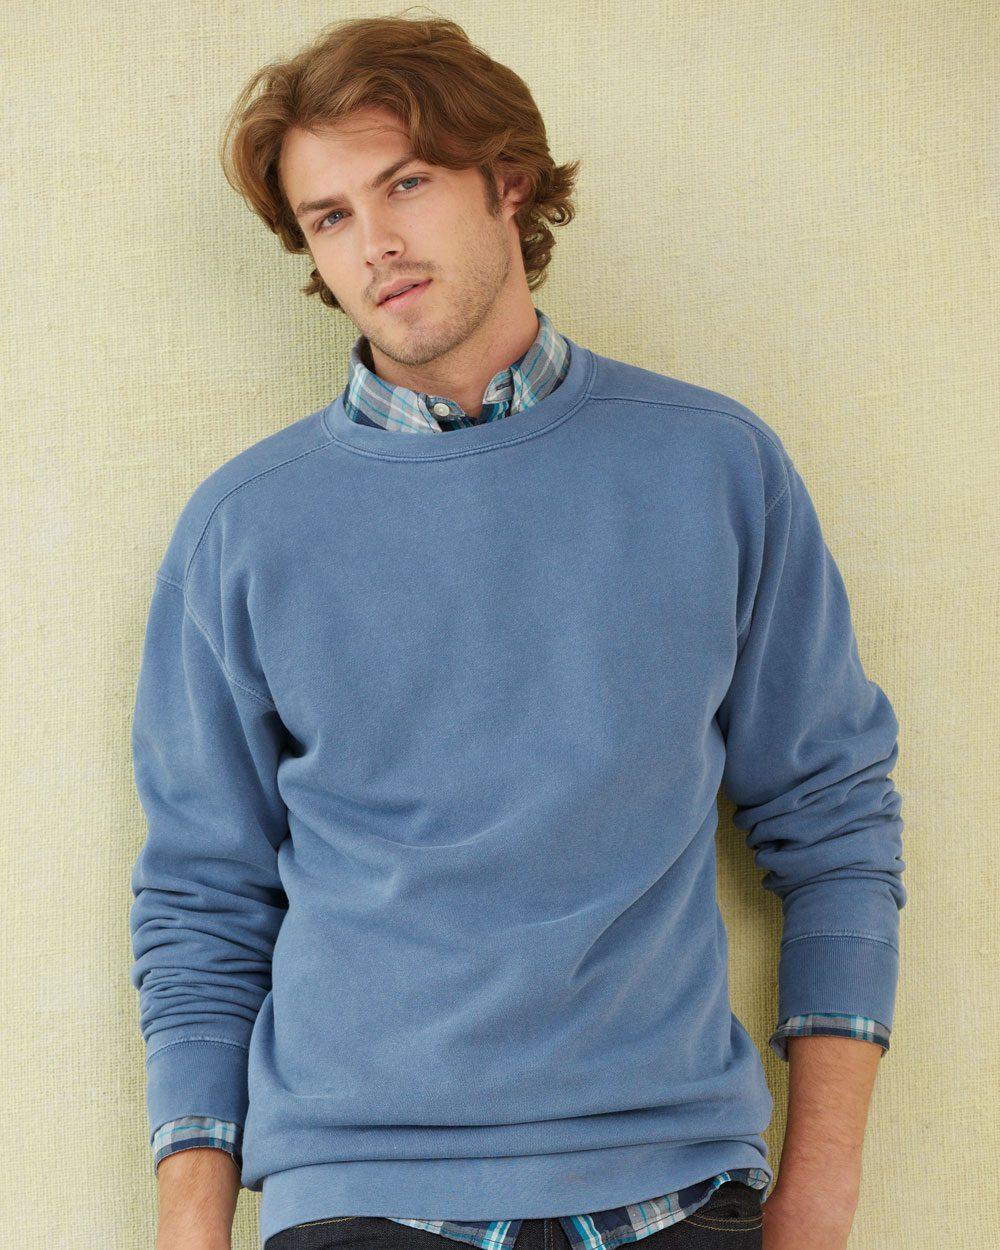 Comfort Colors 1566     Adult Crewneck Sweatshirt    80% Ring Spun Cotton/20% Polyester